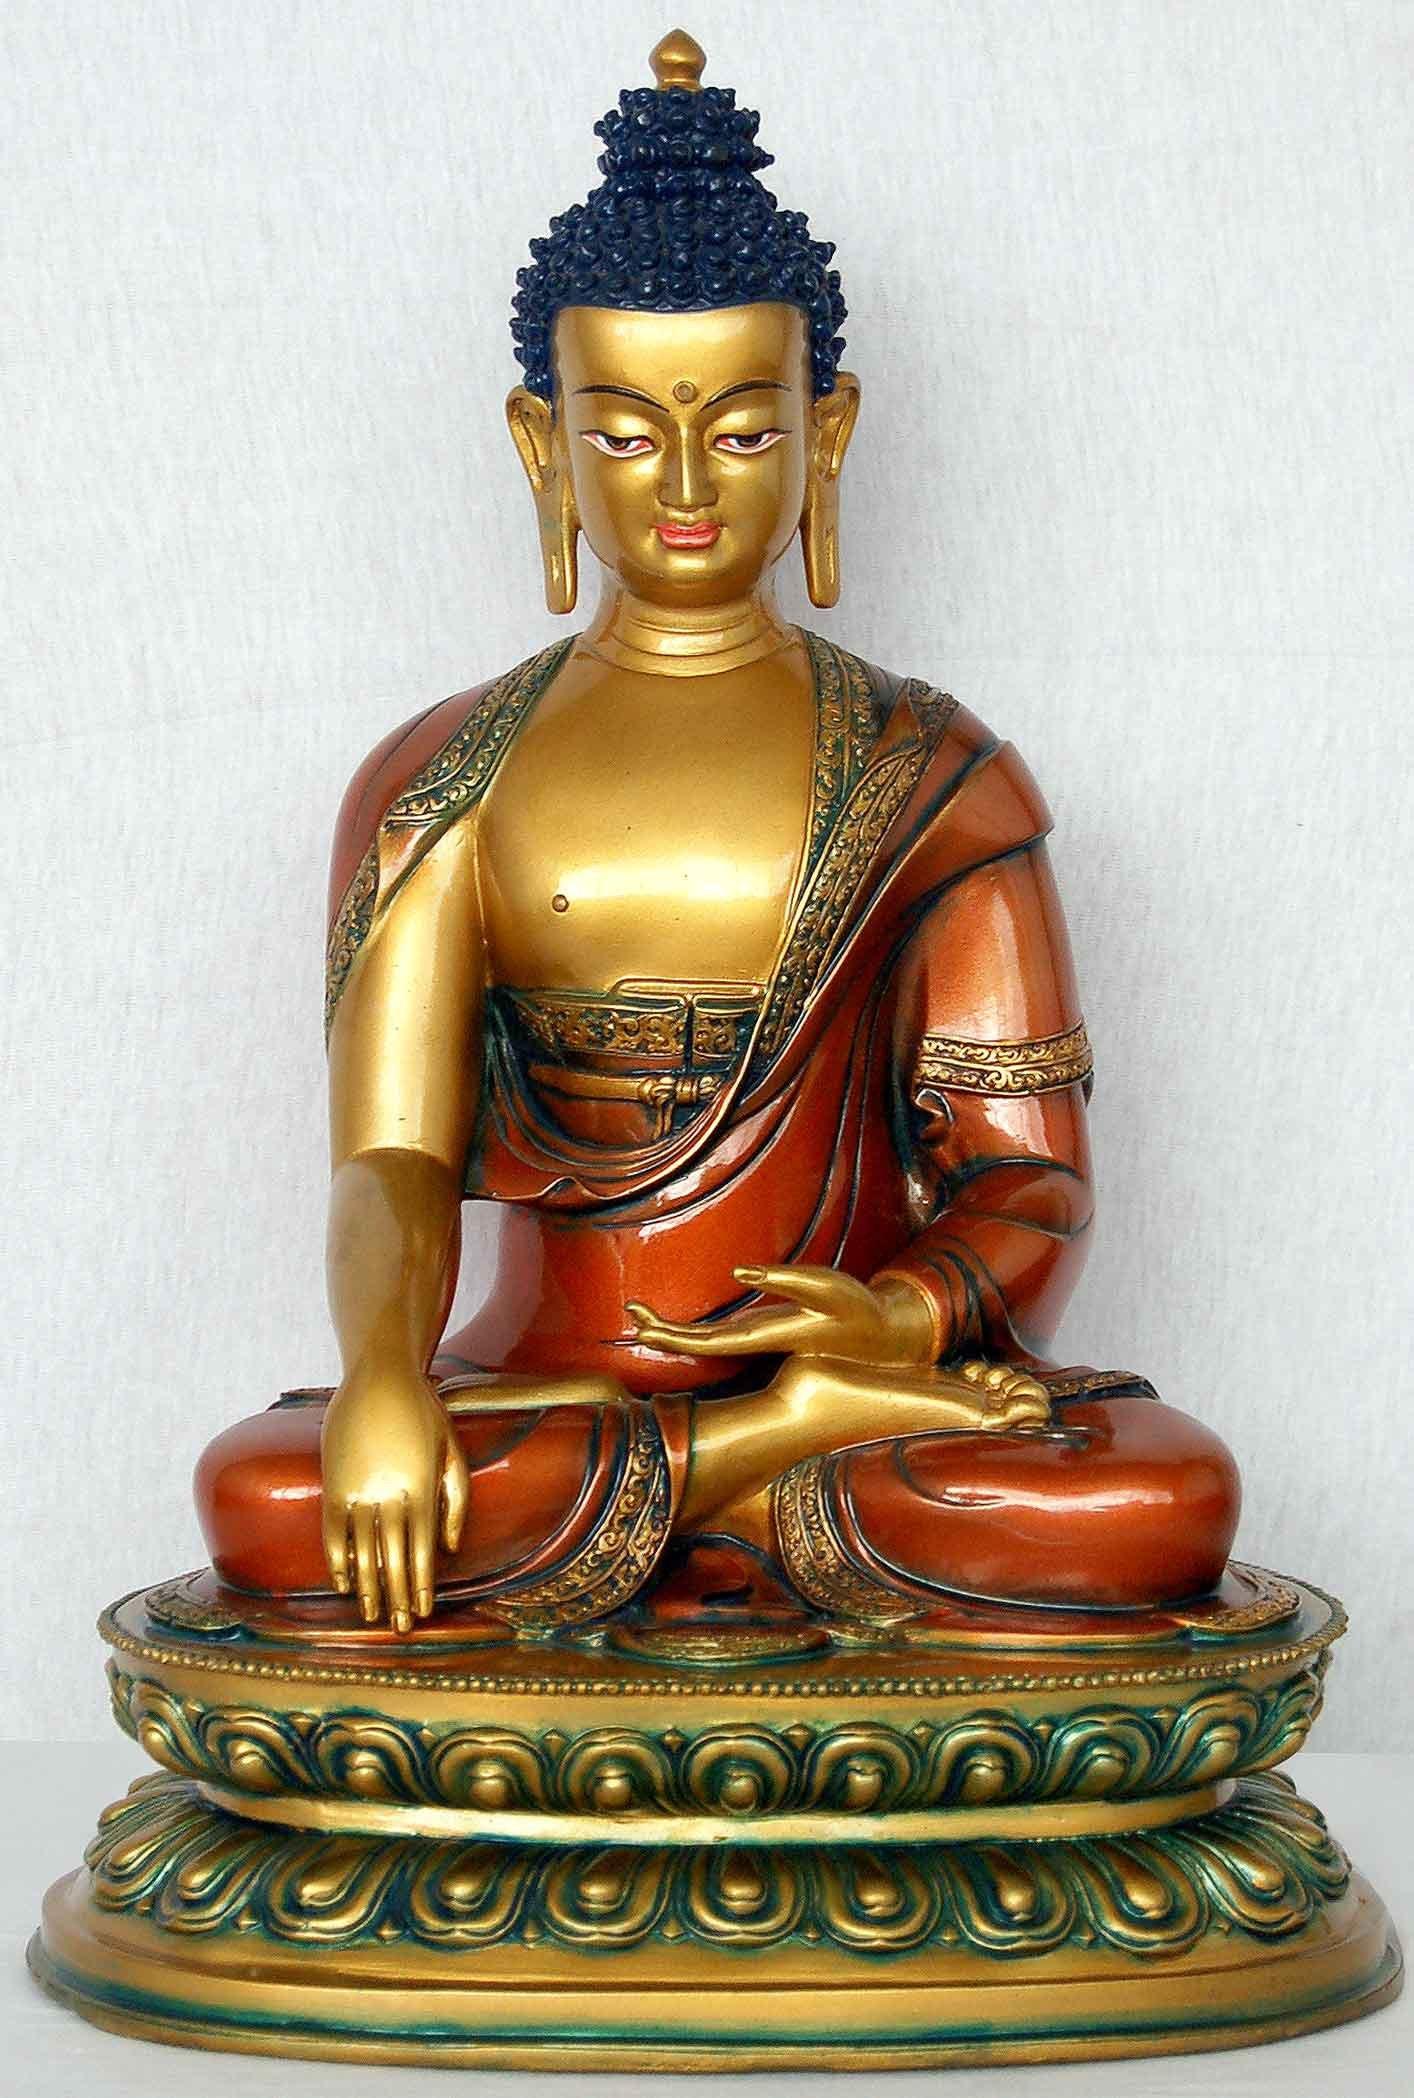 buddha statues buy tibetan buddha statues product on. Black Bedroom Furniture Sets. Home Design Ideas